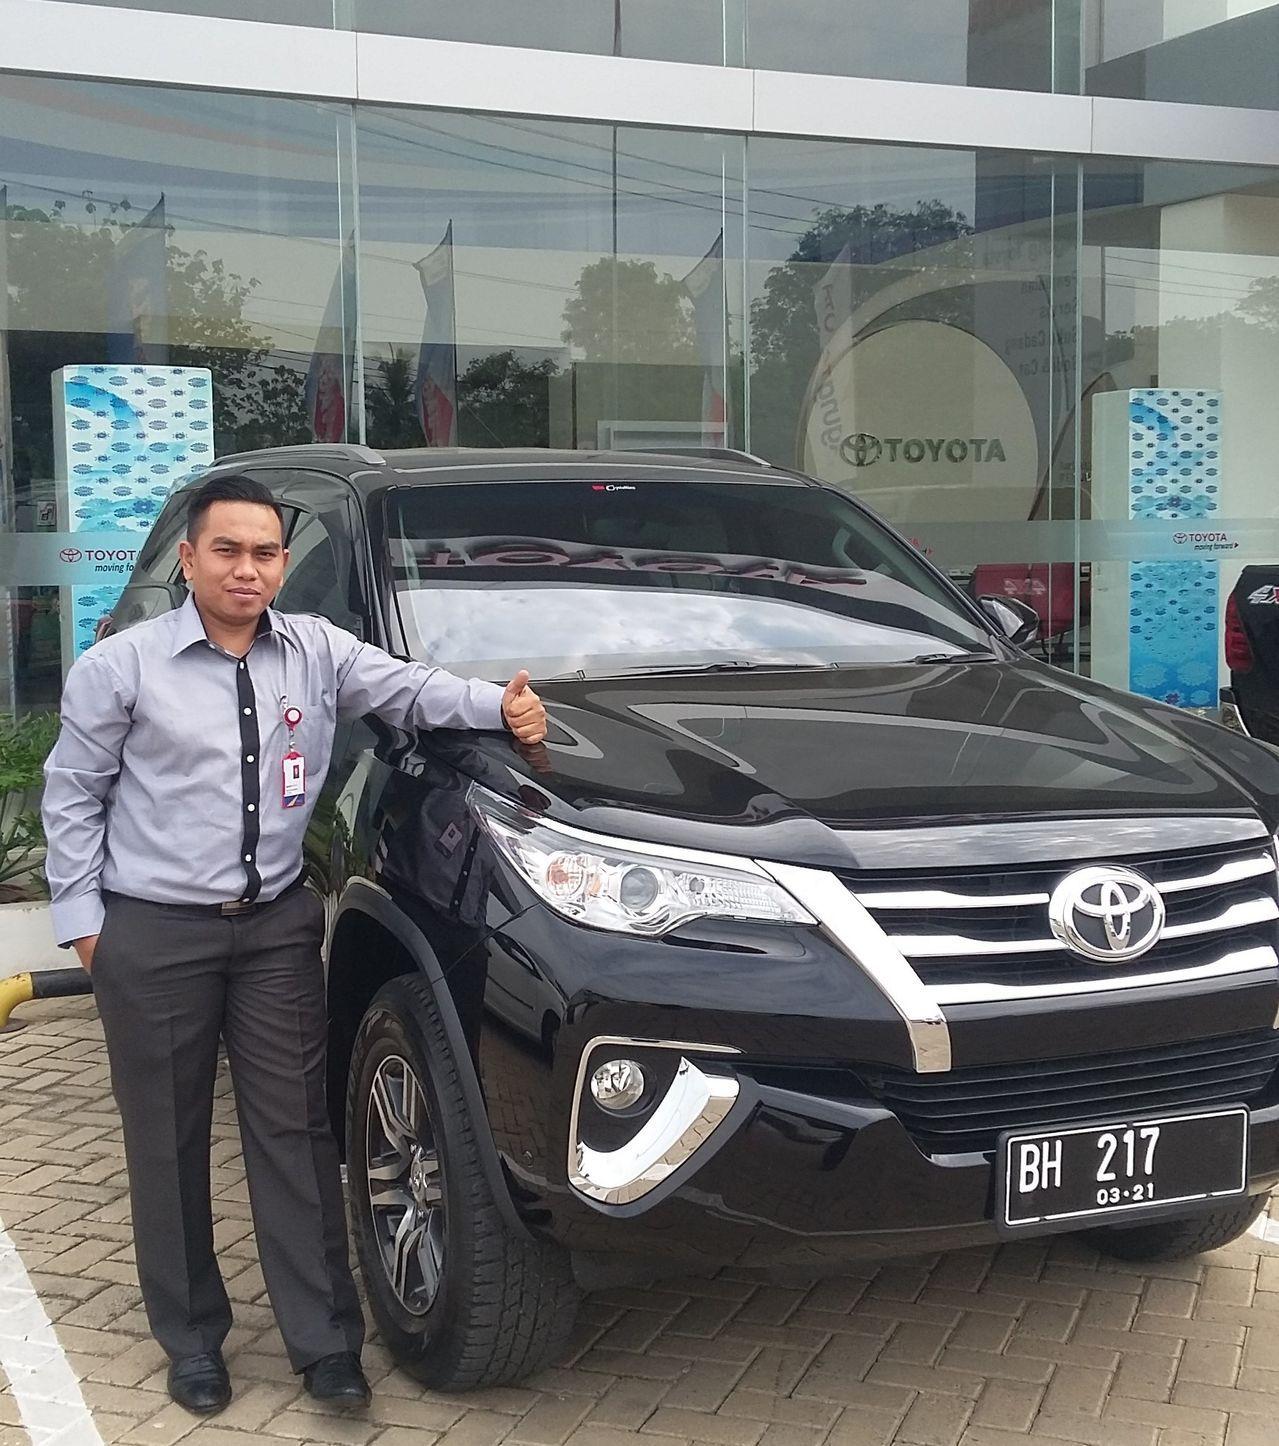 Dealer Toyota Jambi Harga Mobil Toyota Agya Grand New Avanza Veloz Yaris Innova Fortuner Rush Etios Vios Corolla Altis Ca Land Cruiser Toyota Mobil